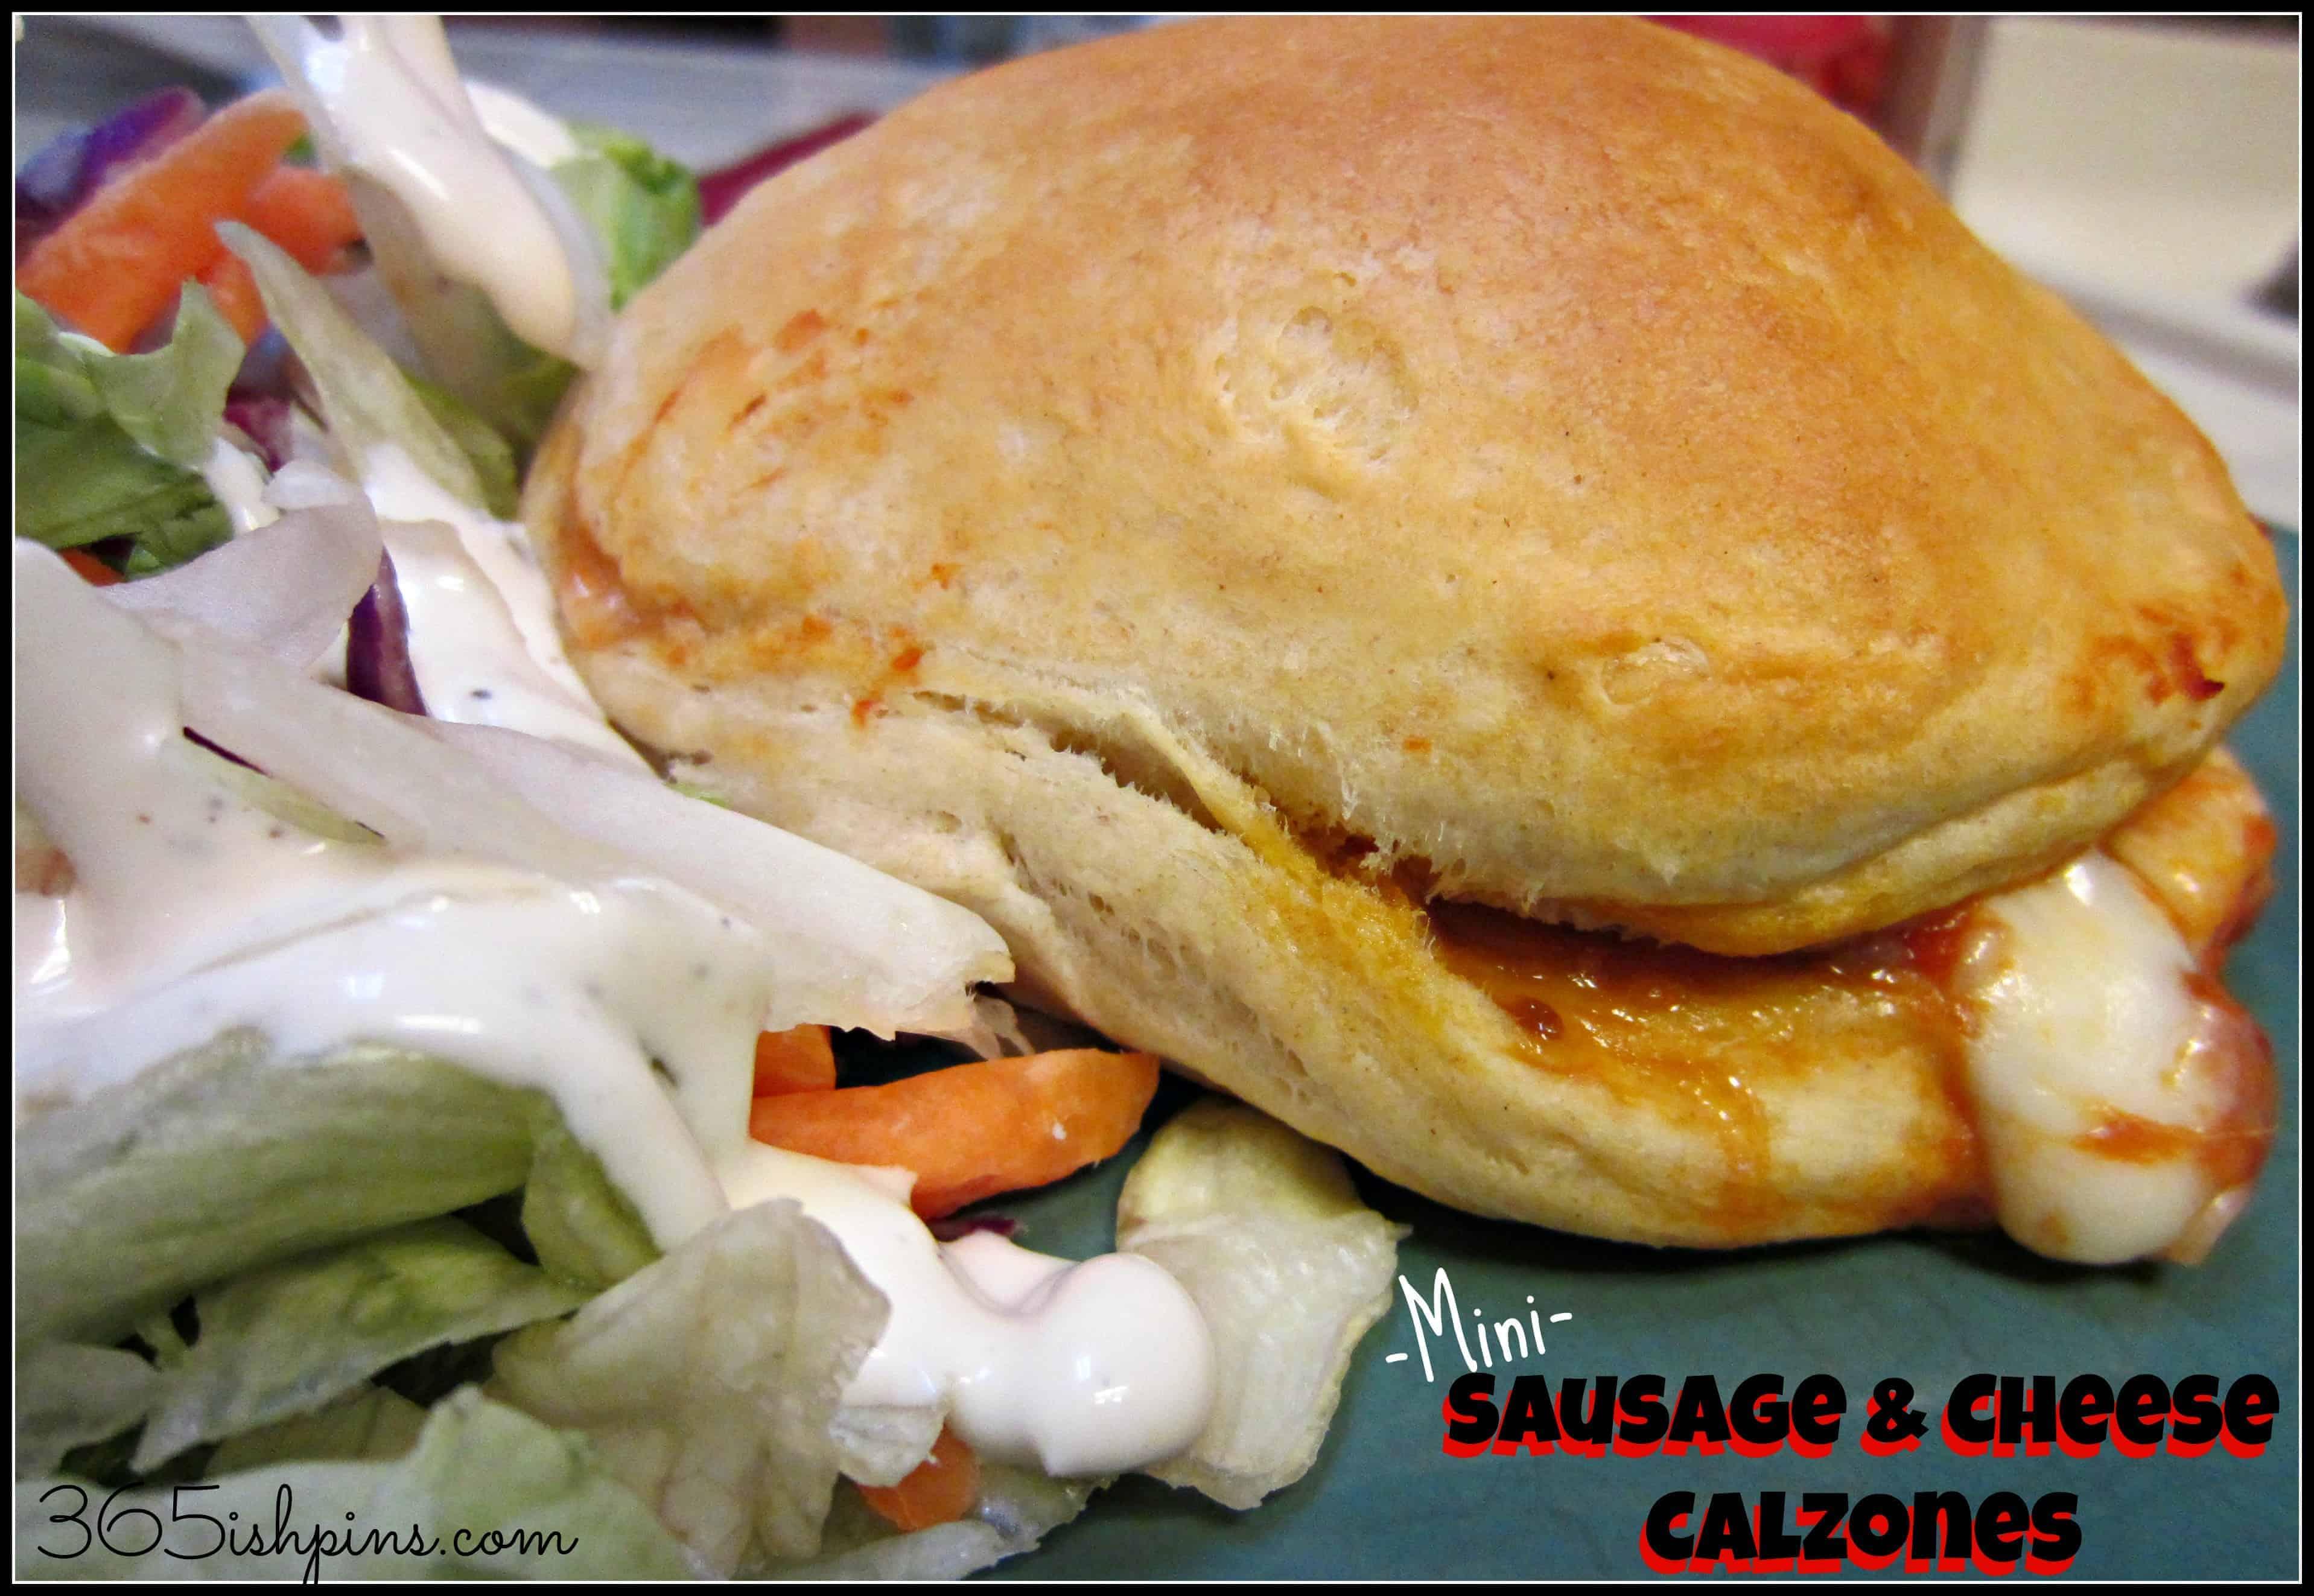 Day 326: Mini Sausage & Cheese Calzones - 365ish Days of Pinterest